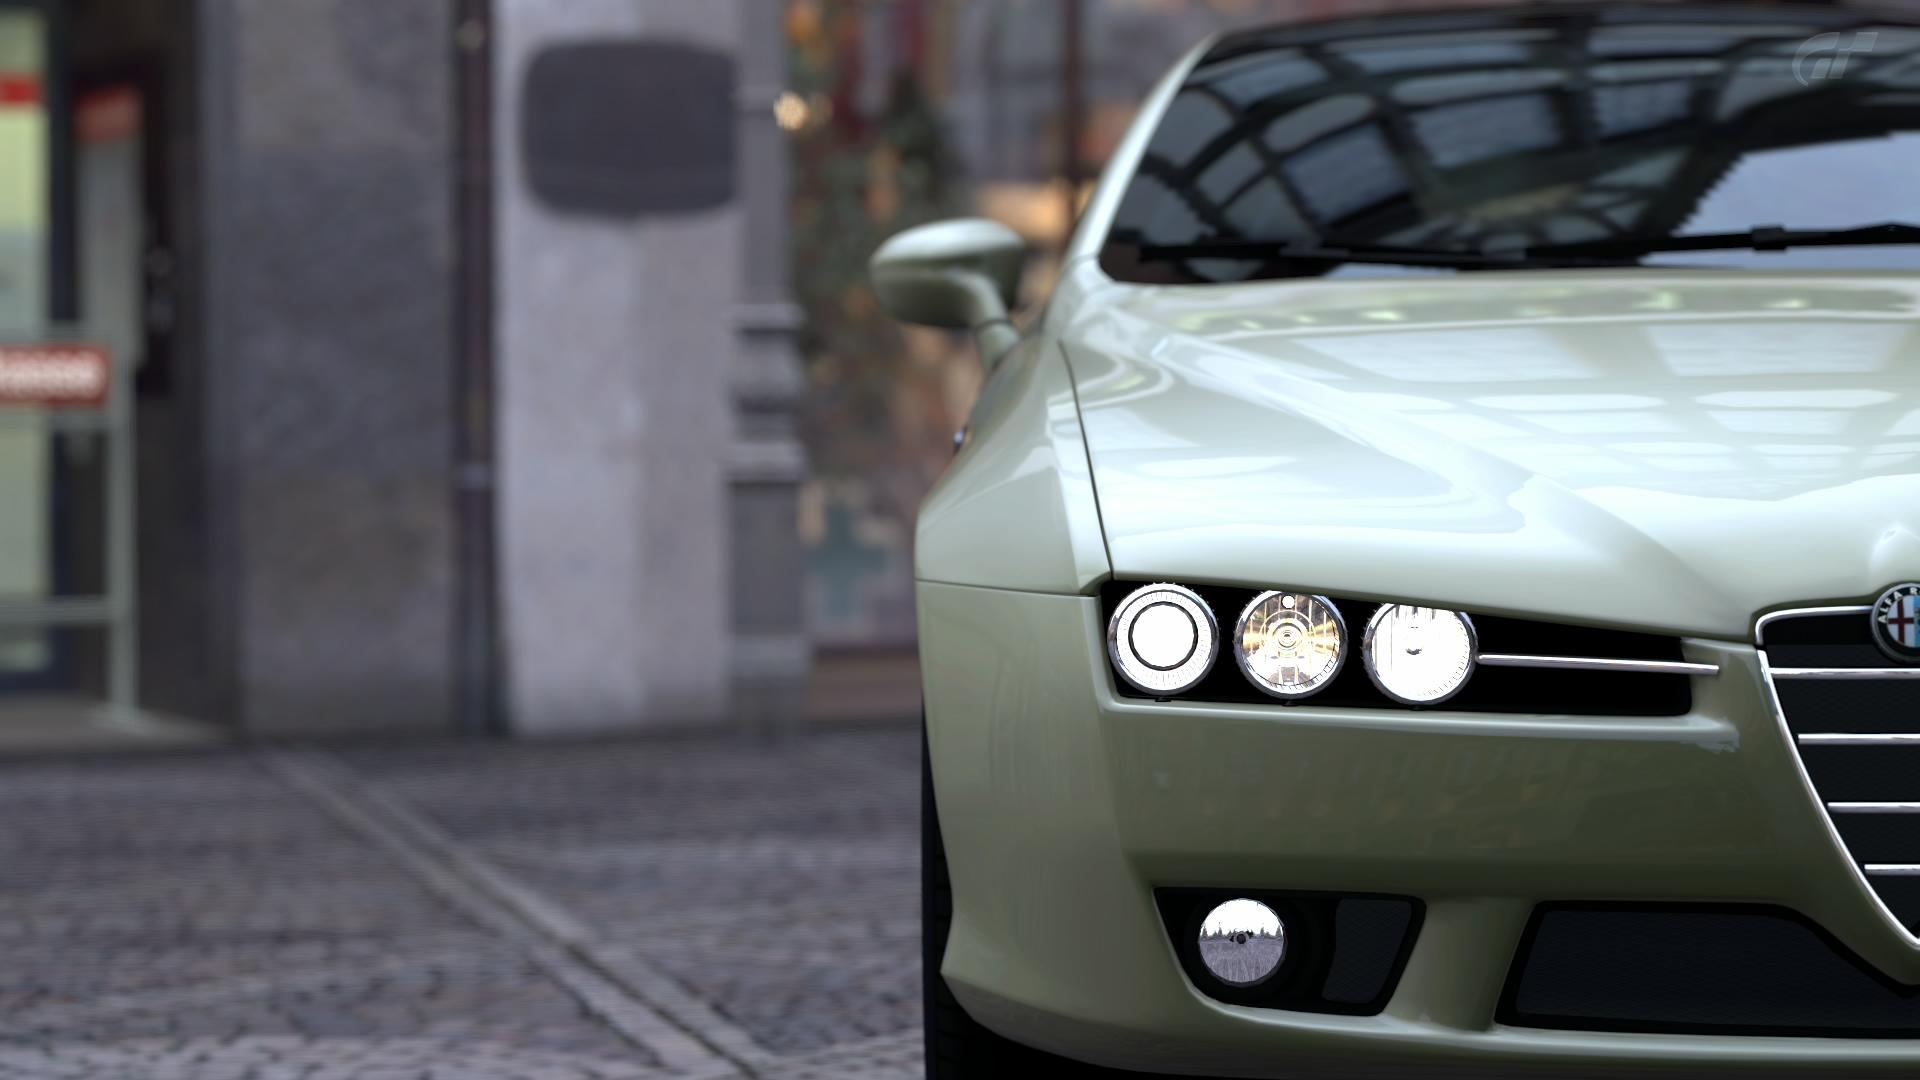 Gran Turismo 5 - Alfa Romeo Brera by Plageman18